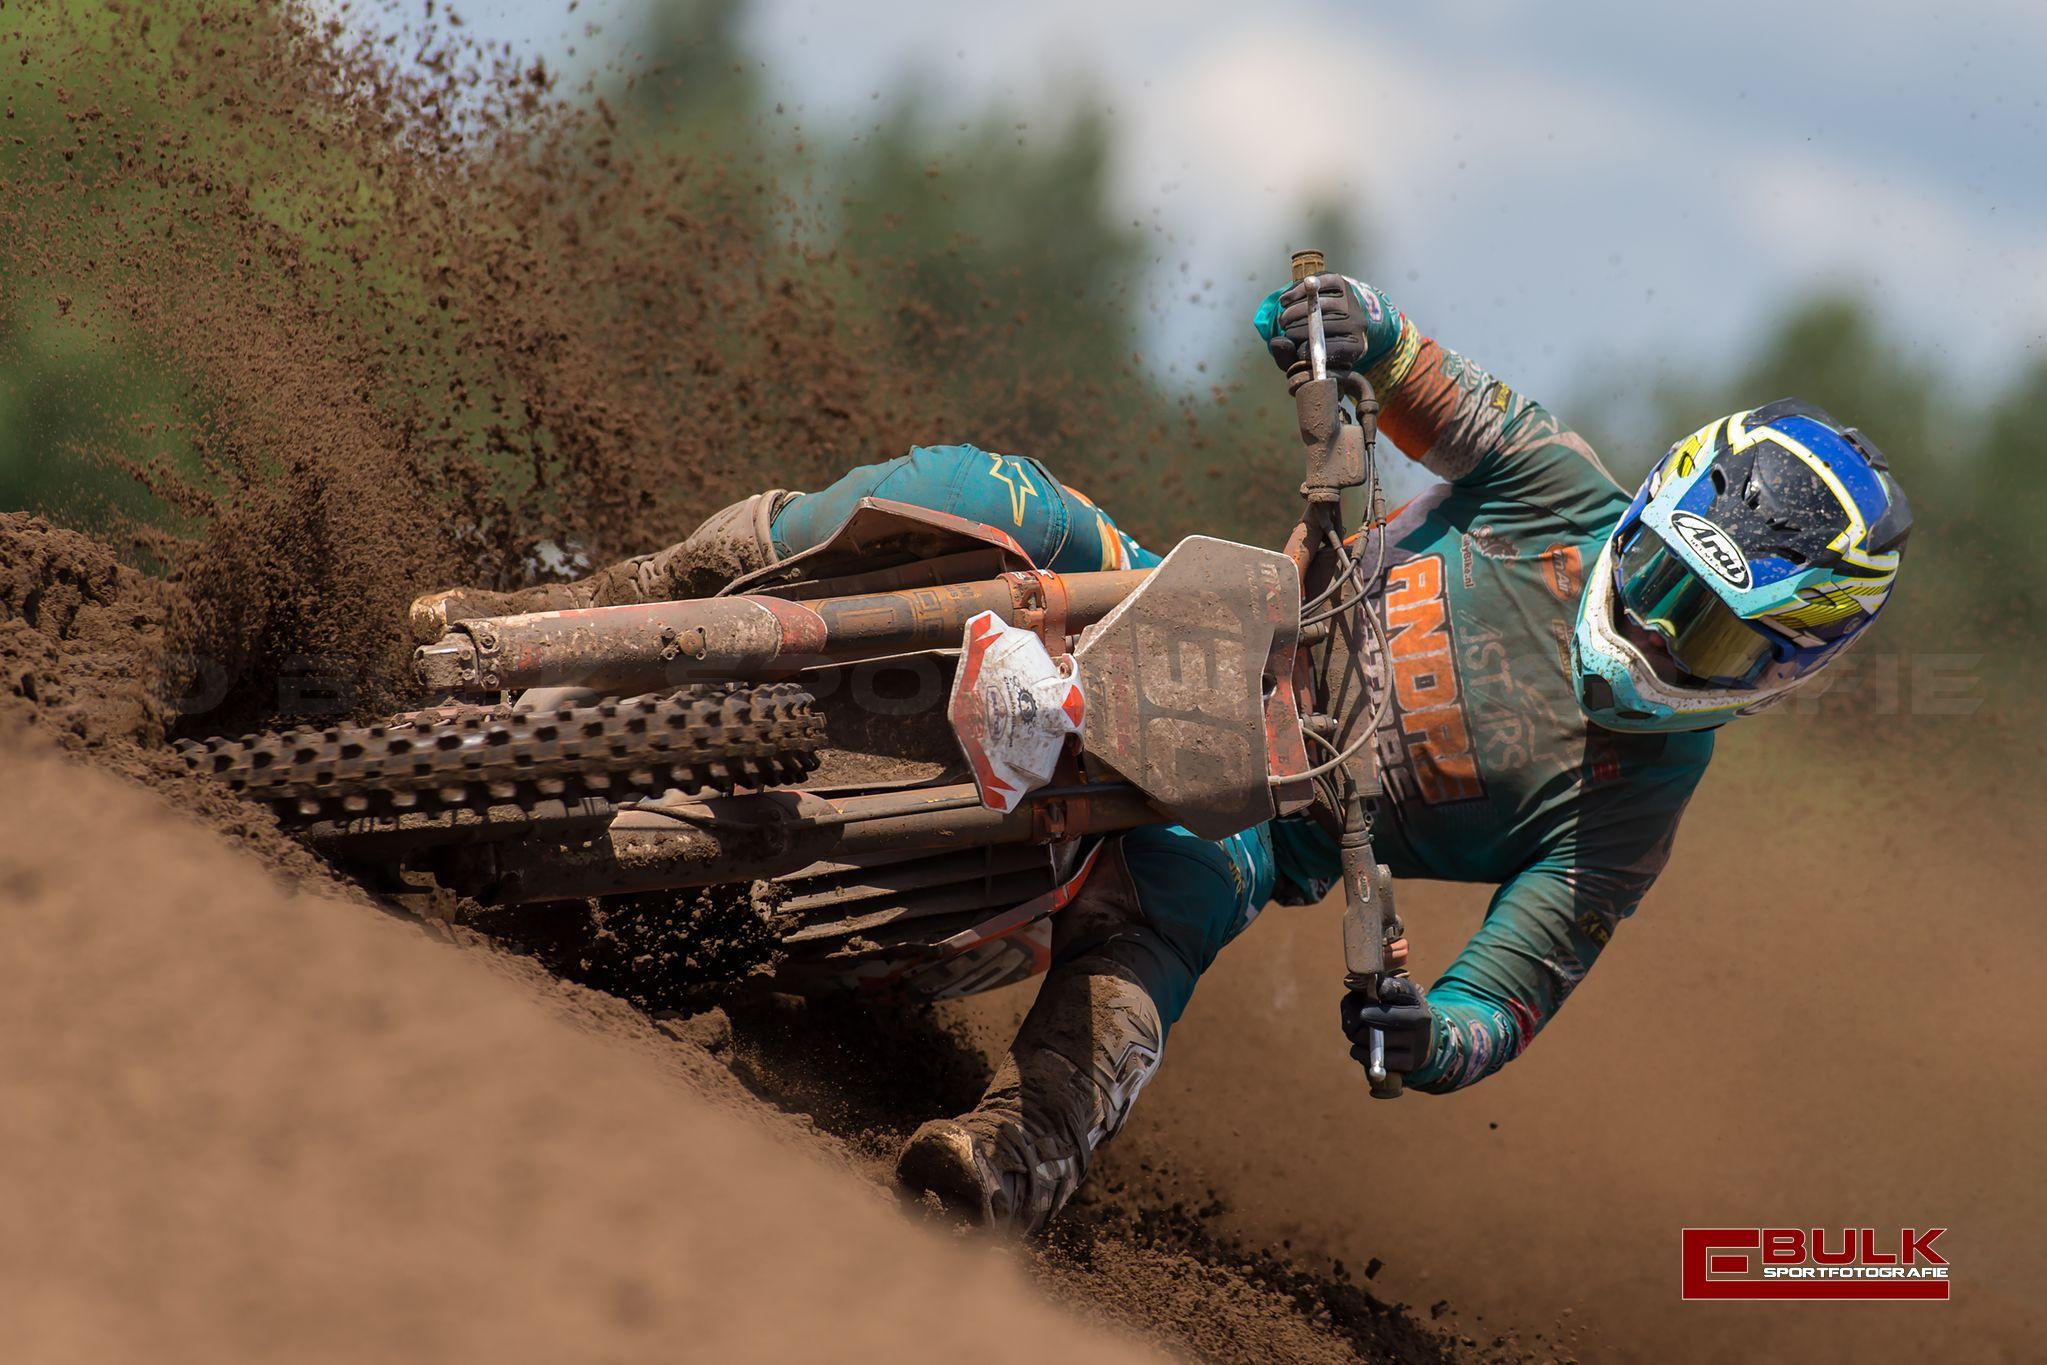 _ebs0702-ed_bulk_sportfotografie